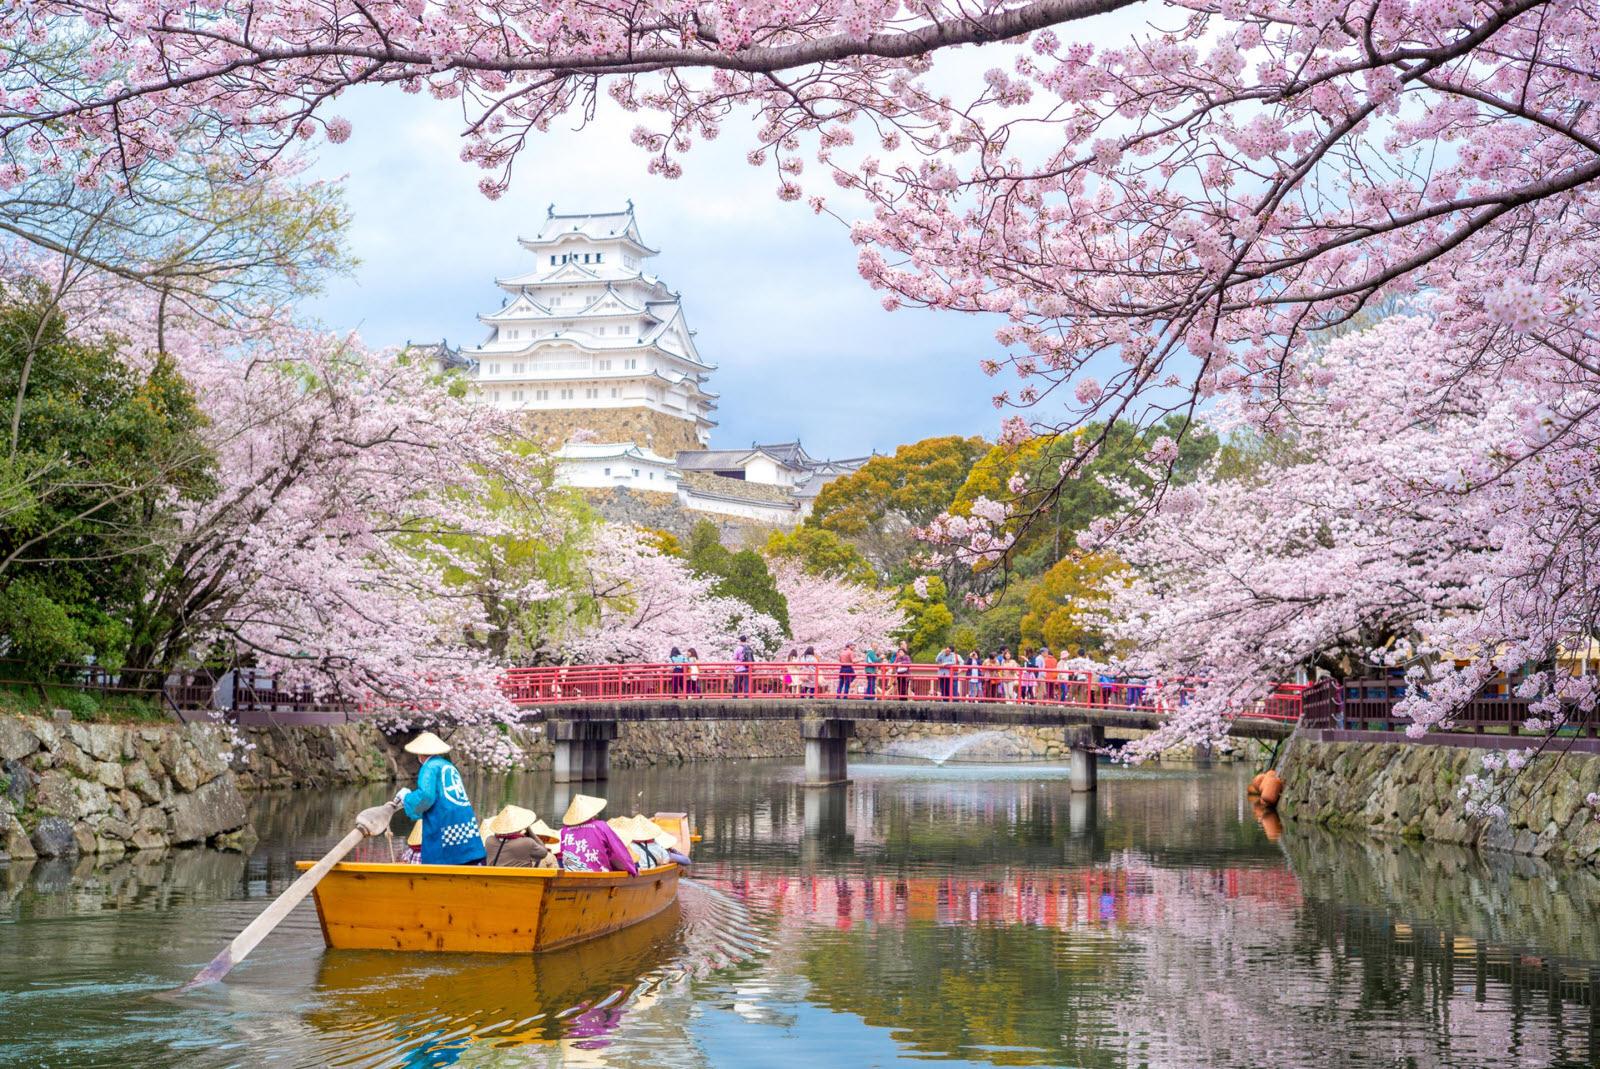 Kastil Himeji dan bunga sakura